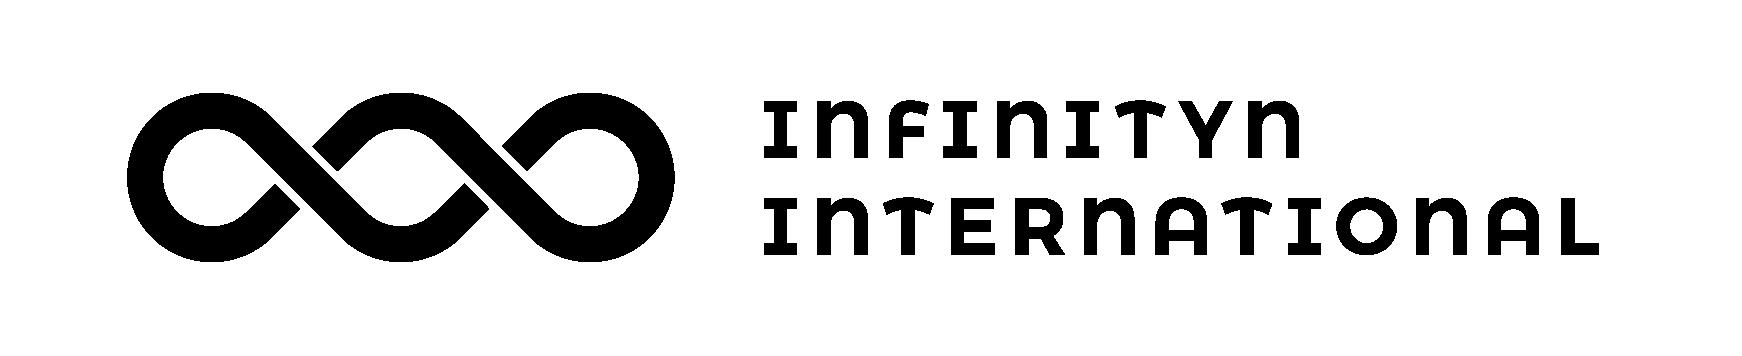 Infinityn international bk logo